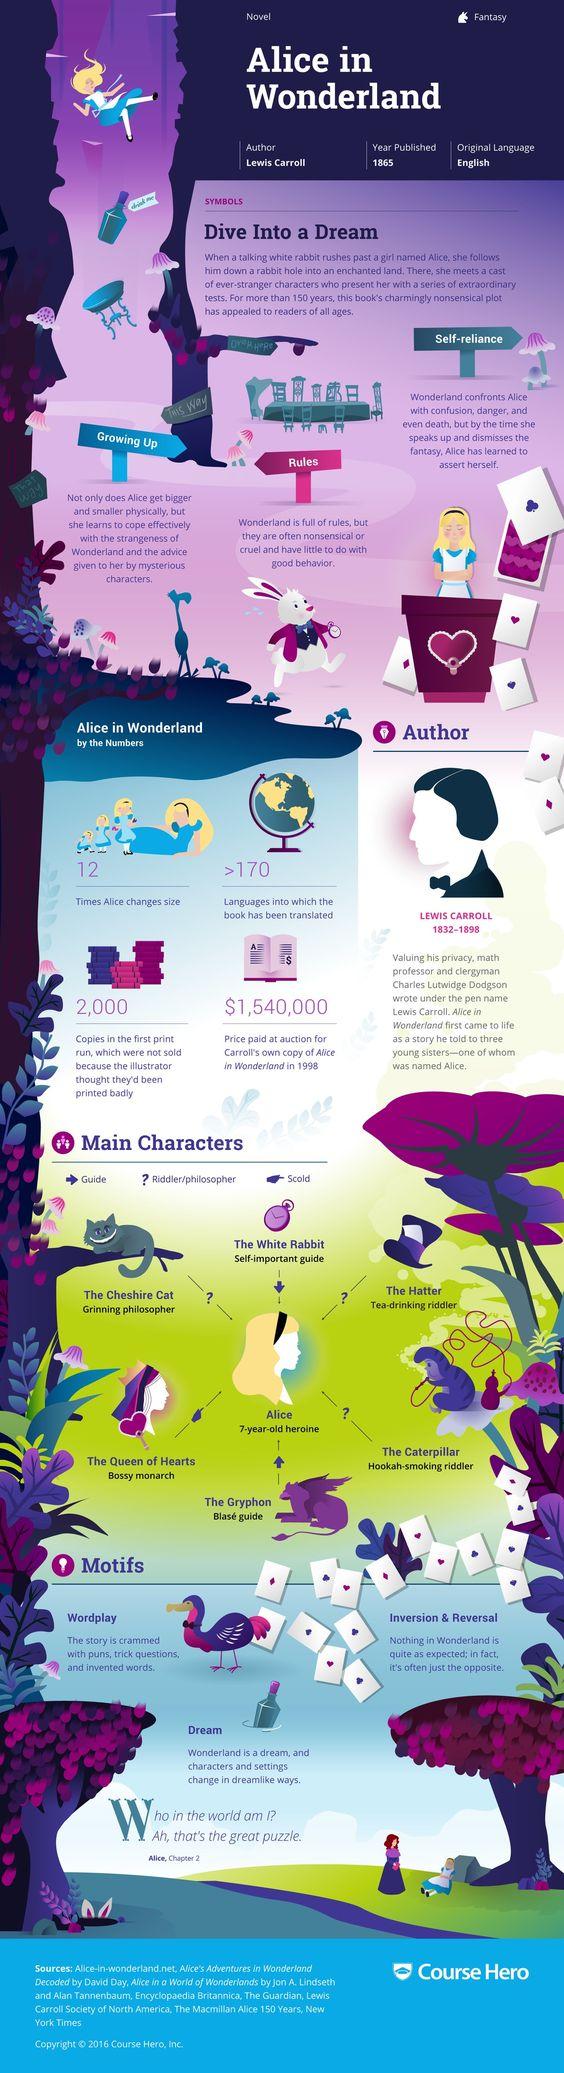 Alice in Wonderland Infographic | Course Hero: